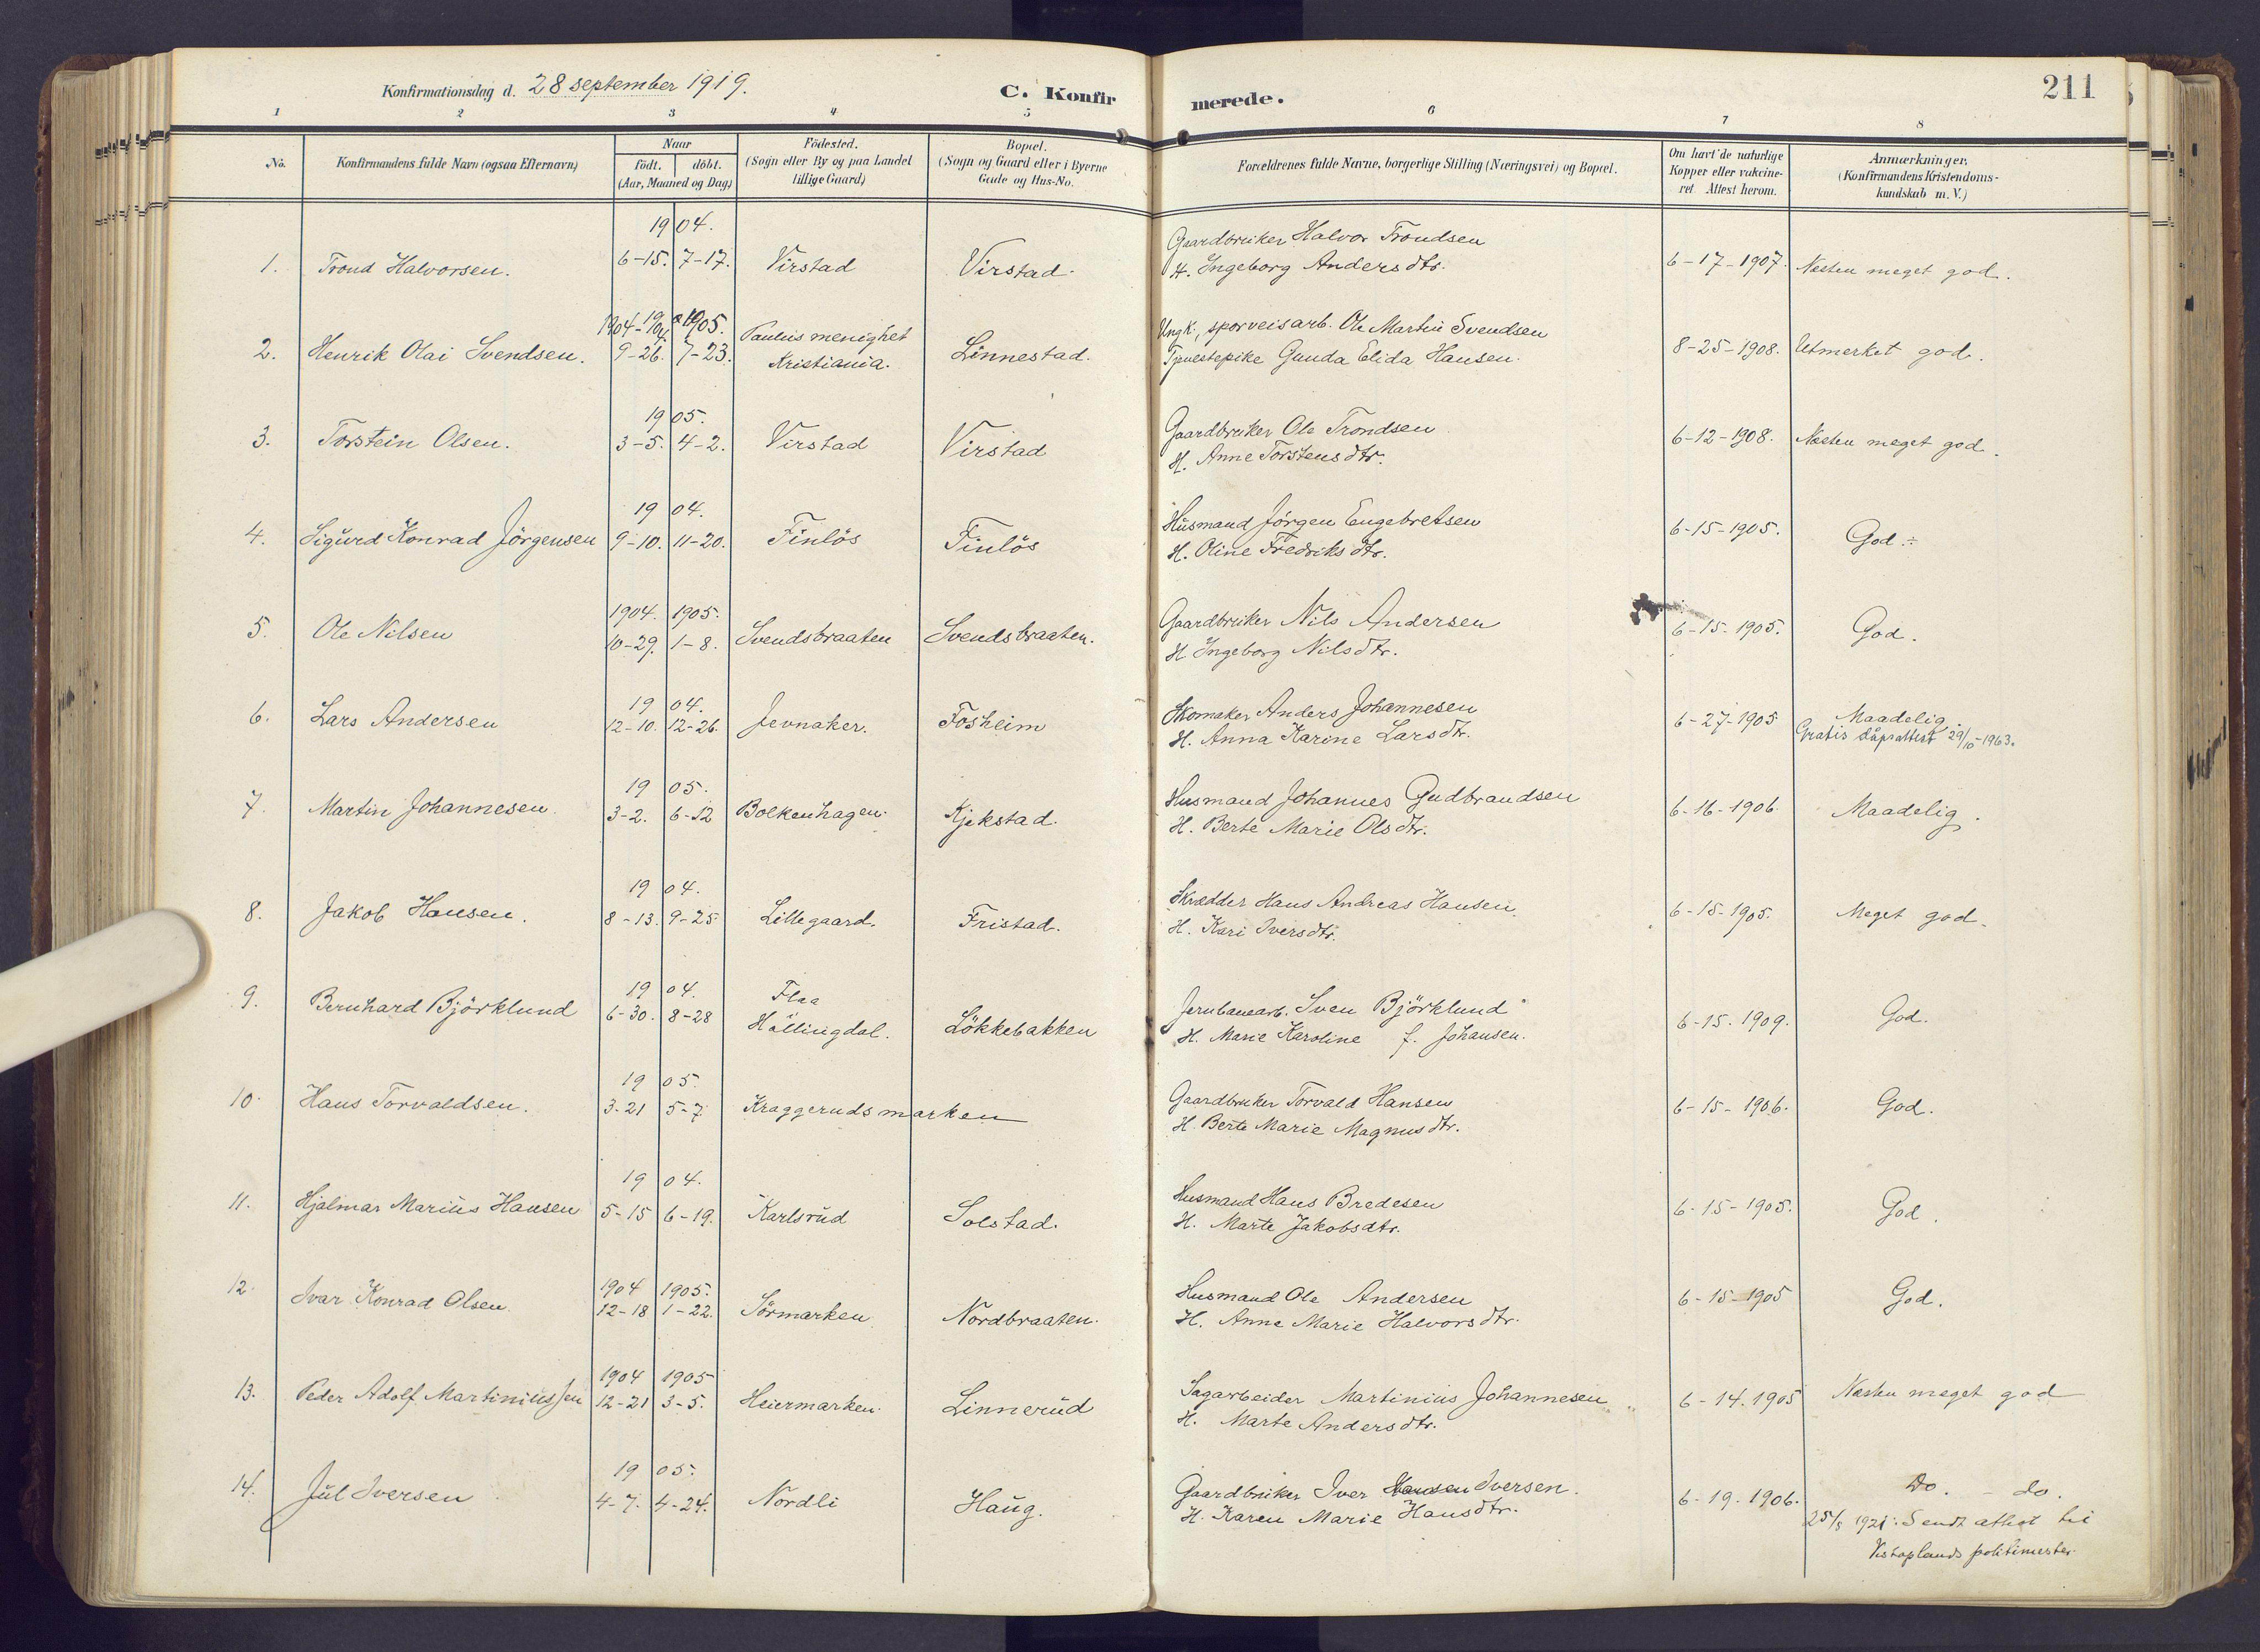 SAH, Lunner prestekontor, H/Ha/Haa/L0001: Ministerialbok nr. 1, 1907-1922, s. 211